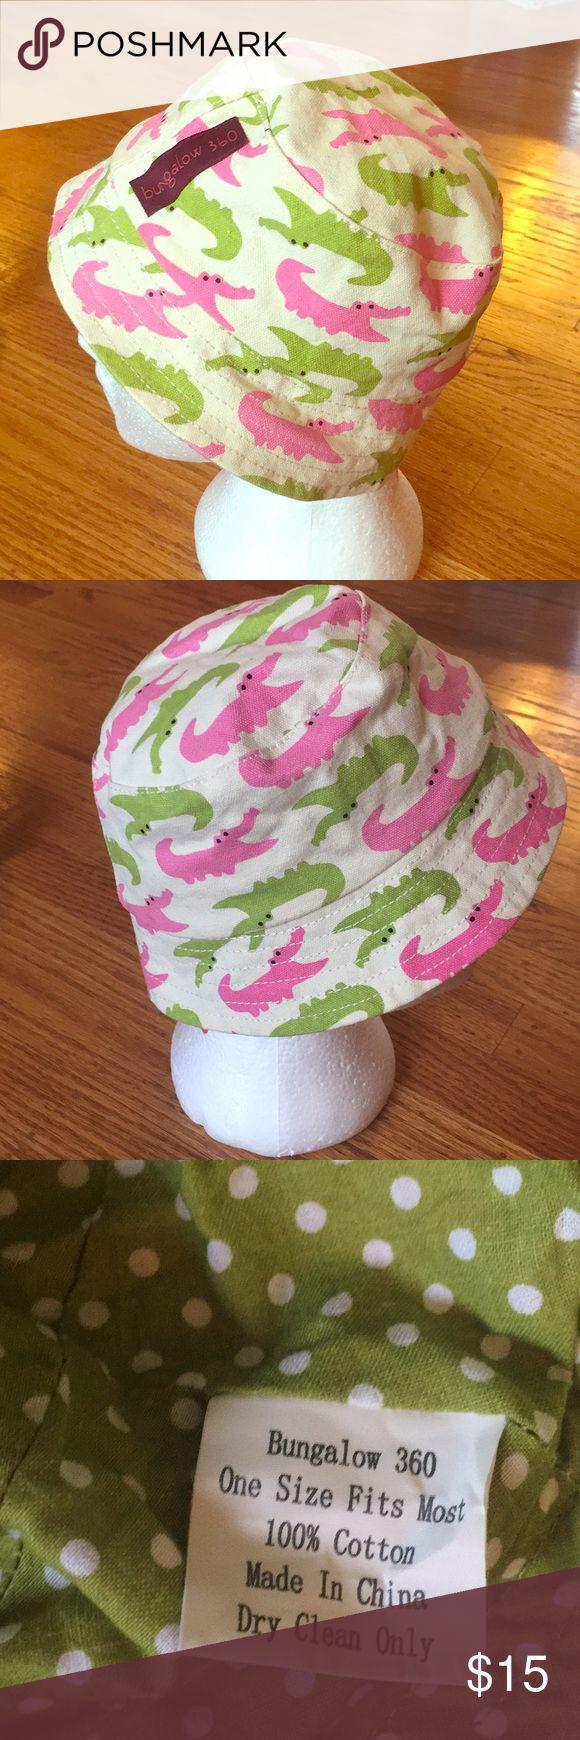 Bungalow 360 alligator bucket hat Children's bucket hat.great condition! bungalow 360 Accessories Hats